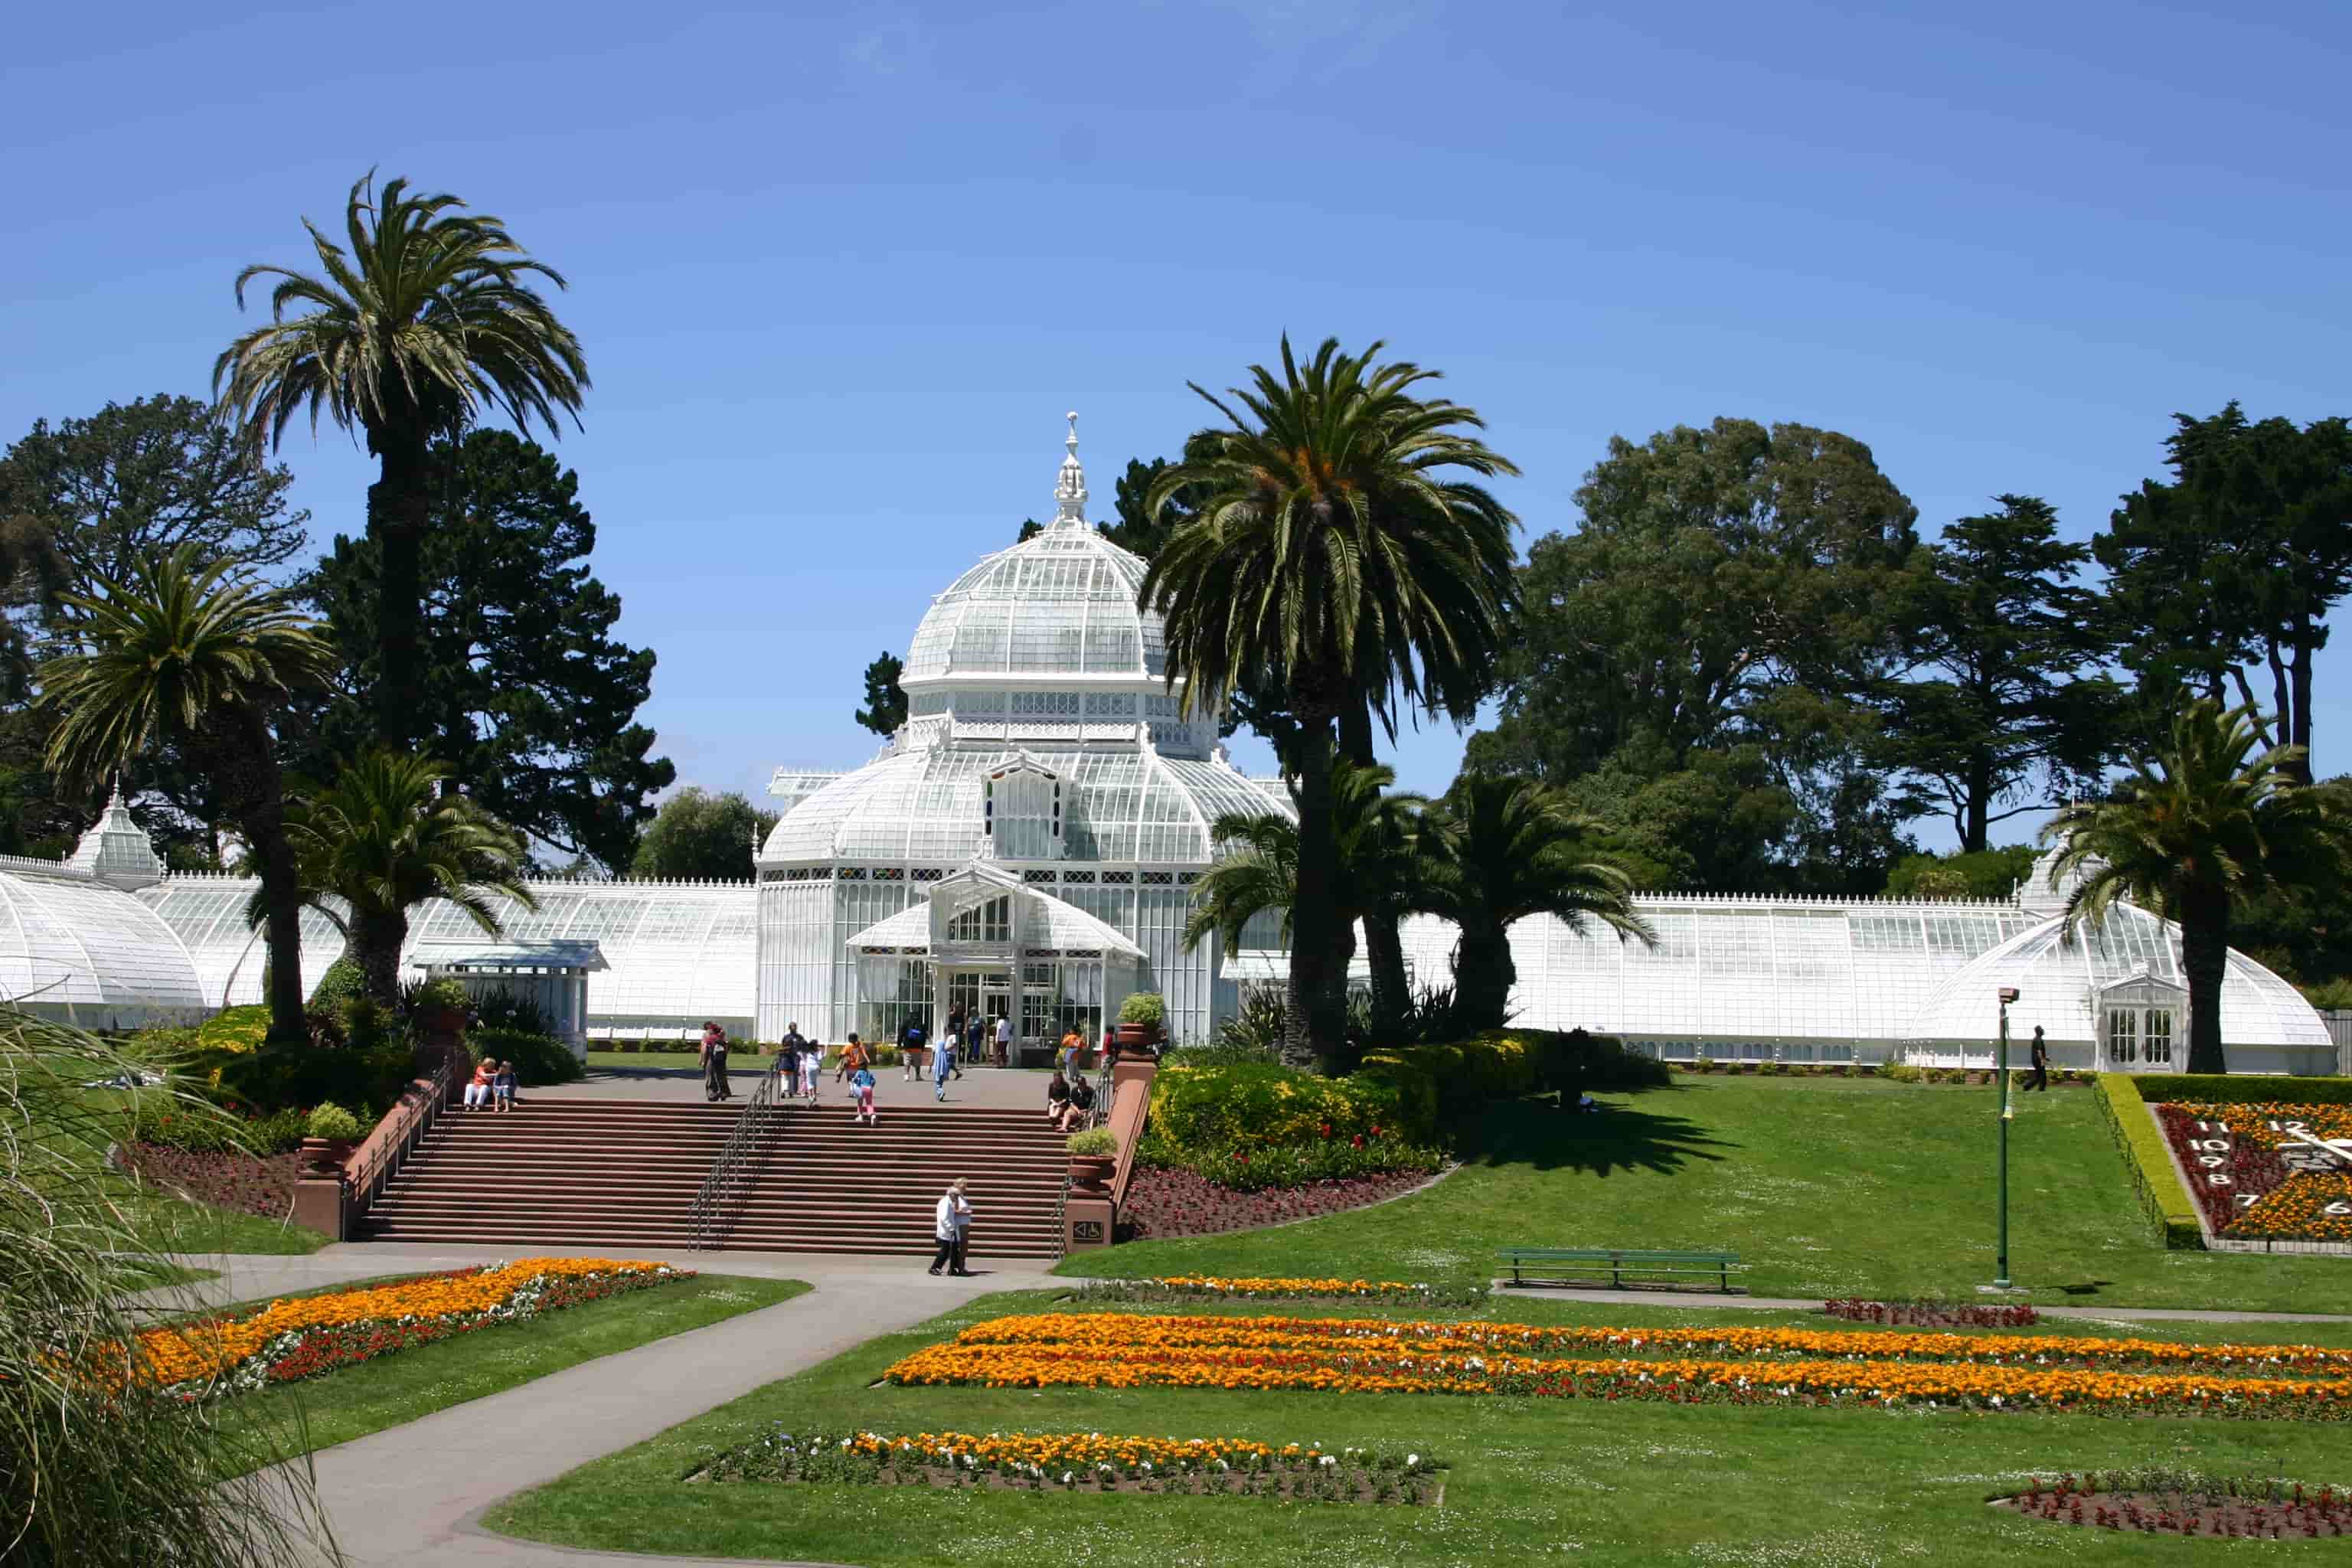 San_Francisco_Golden_Gate_Park_Conservatory_of_Flowers-min